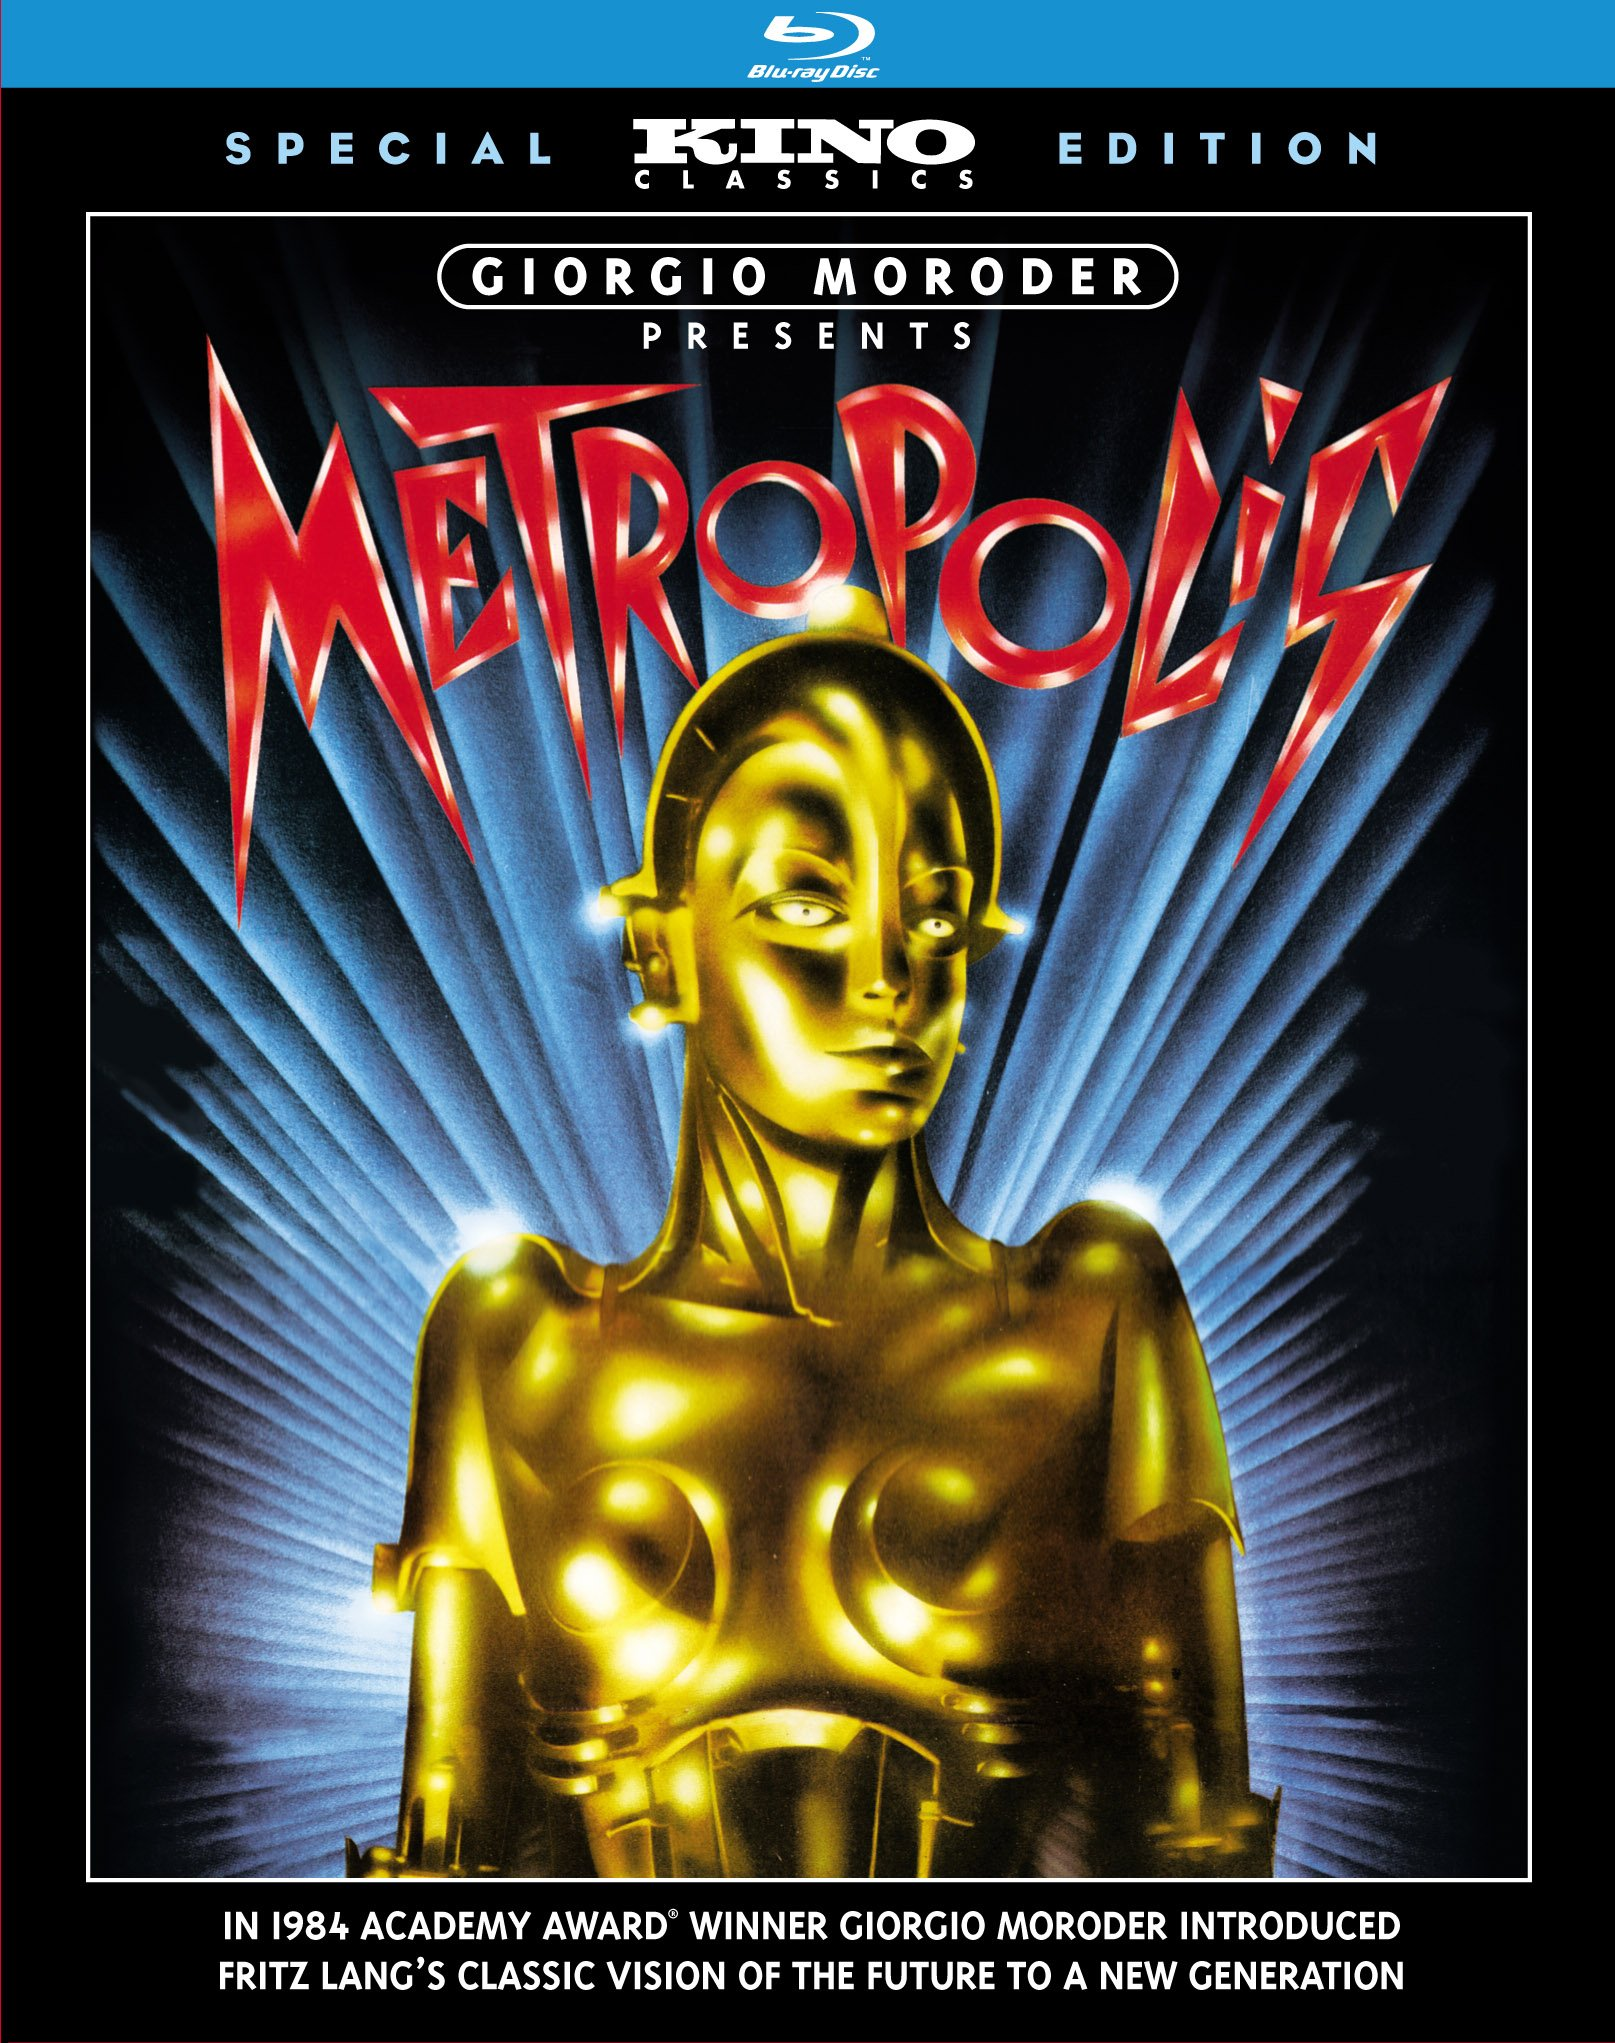 Blu-ray : Gustav Froehlich - Metropolis (Special Edition, AC-3)